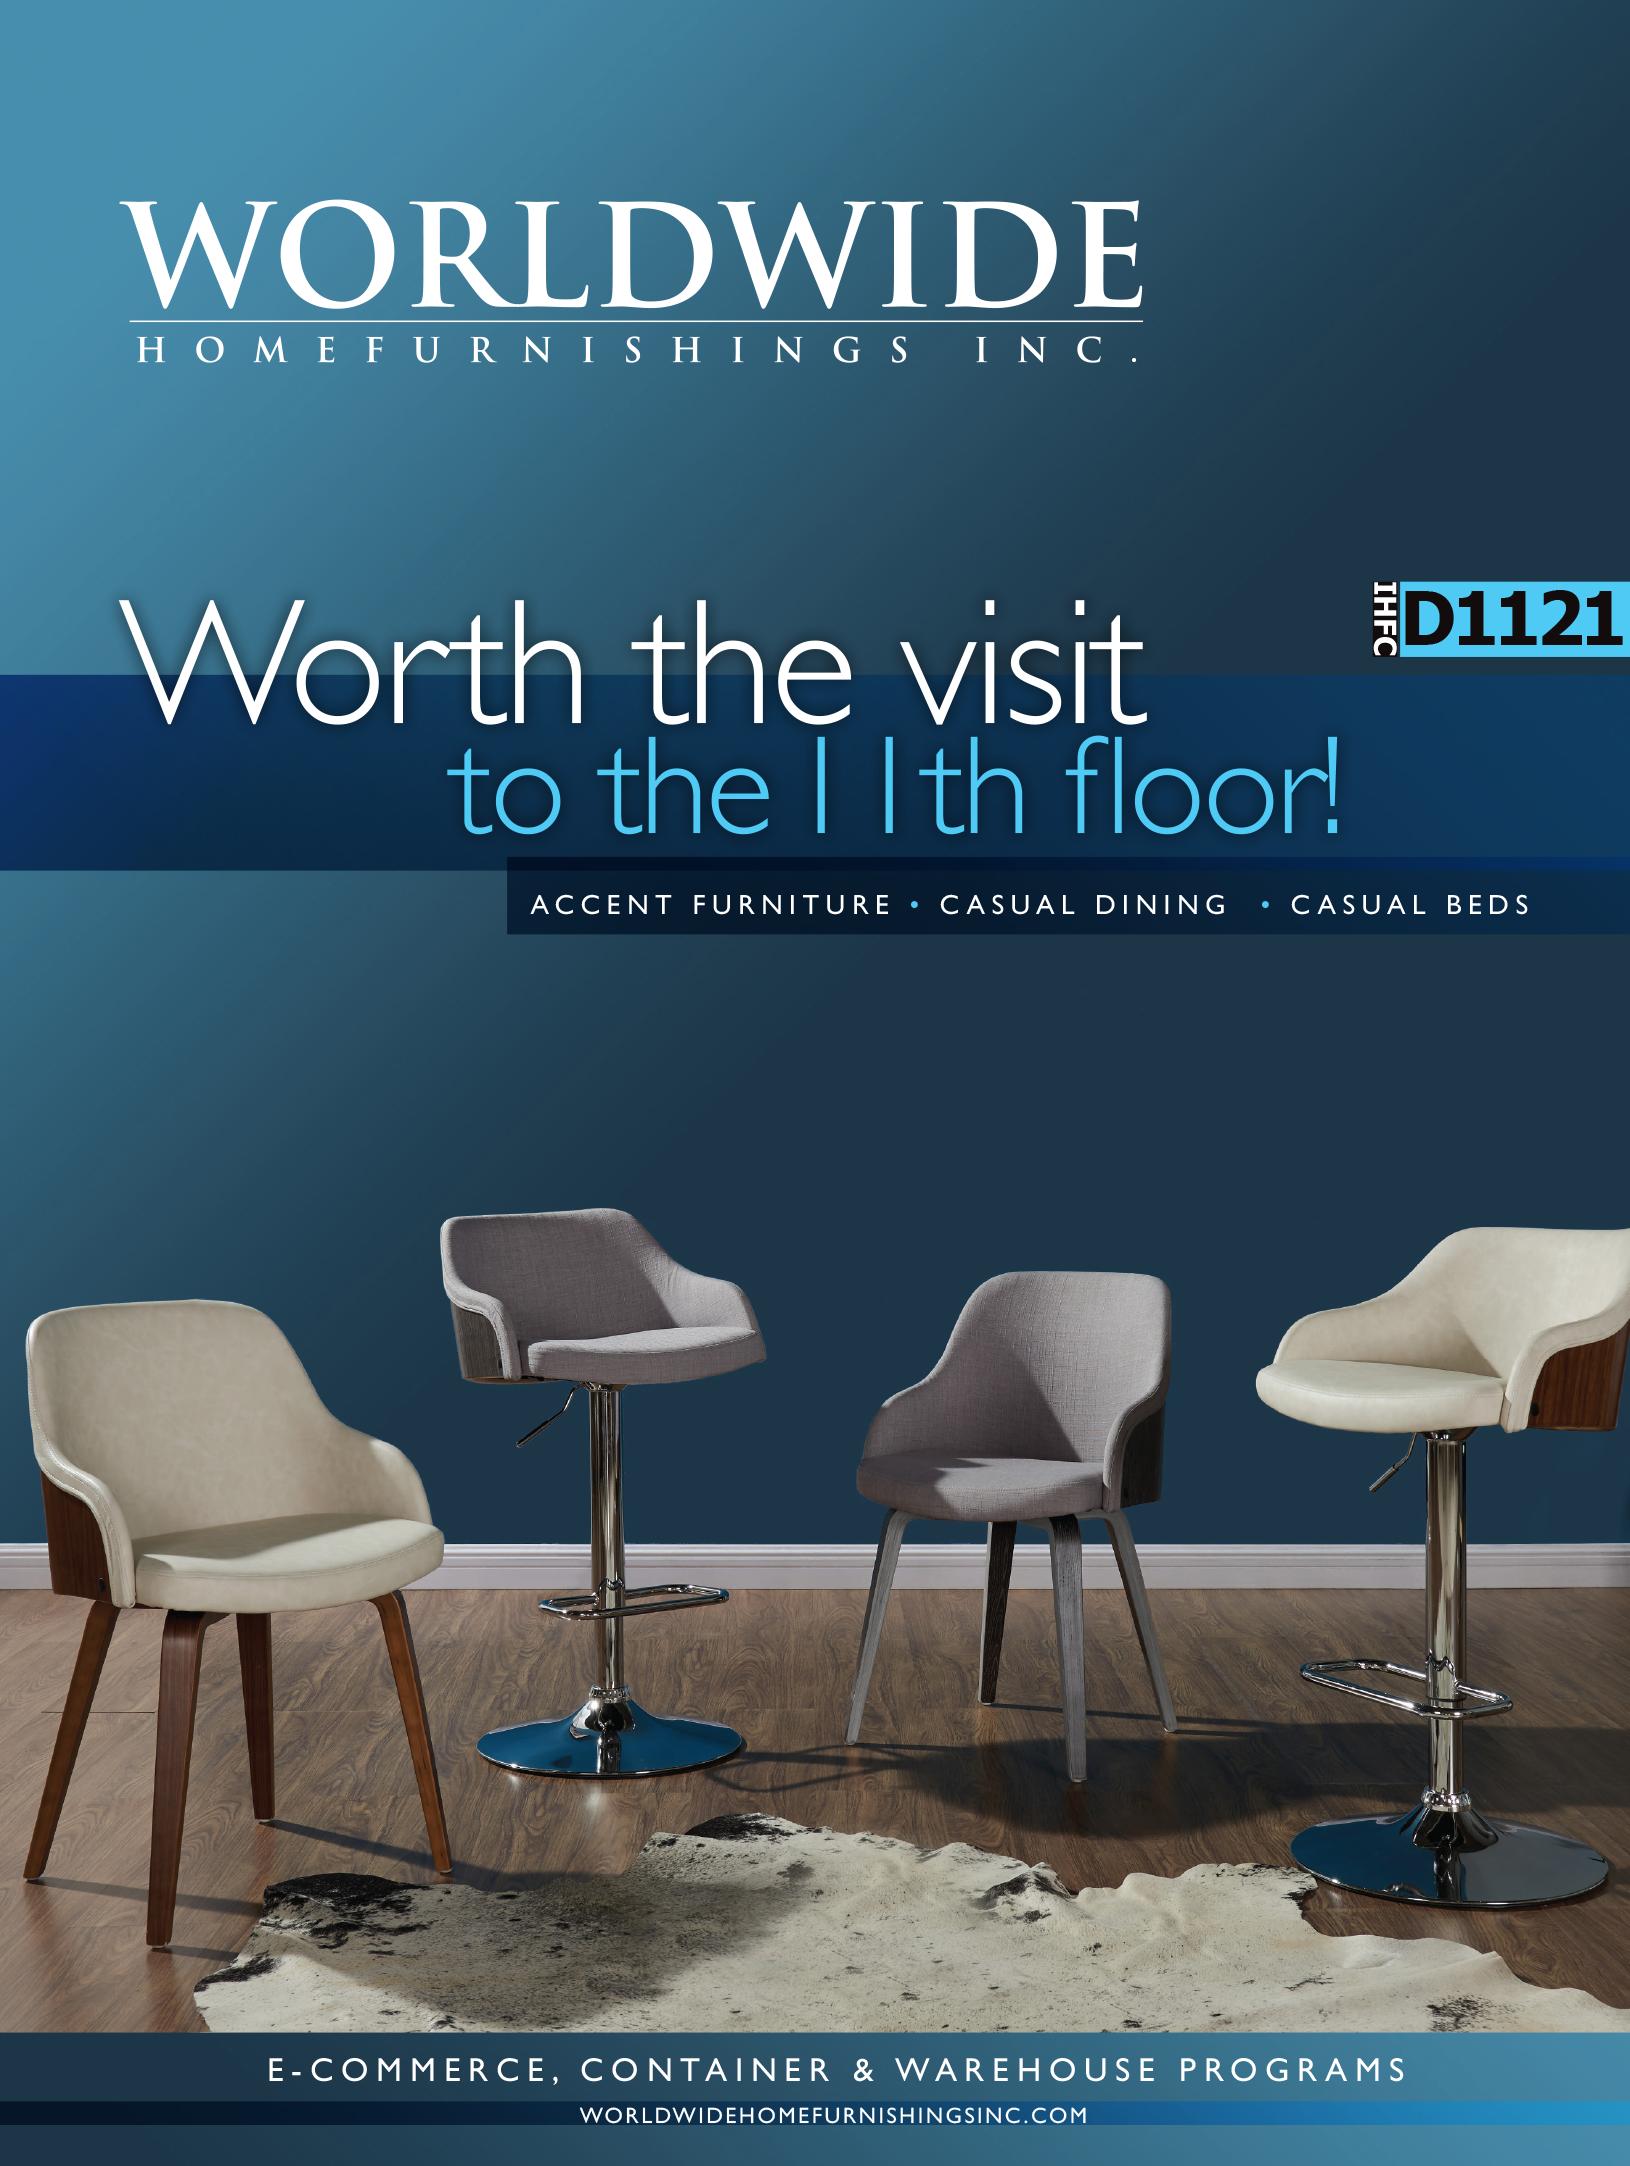 Worldwide Homefurnishings Trade Show Campaign